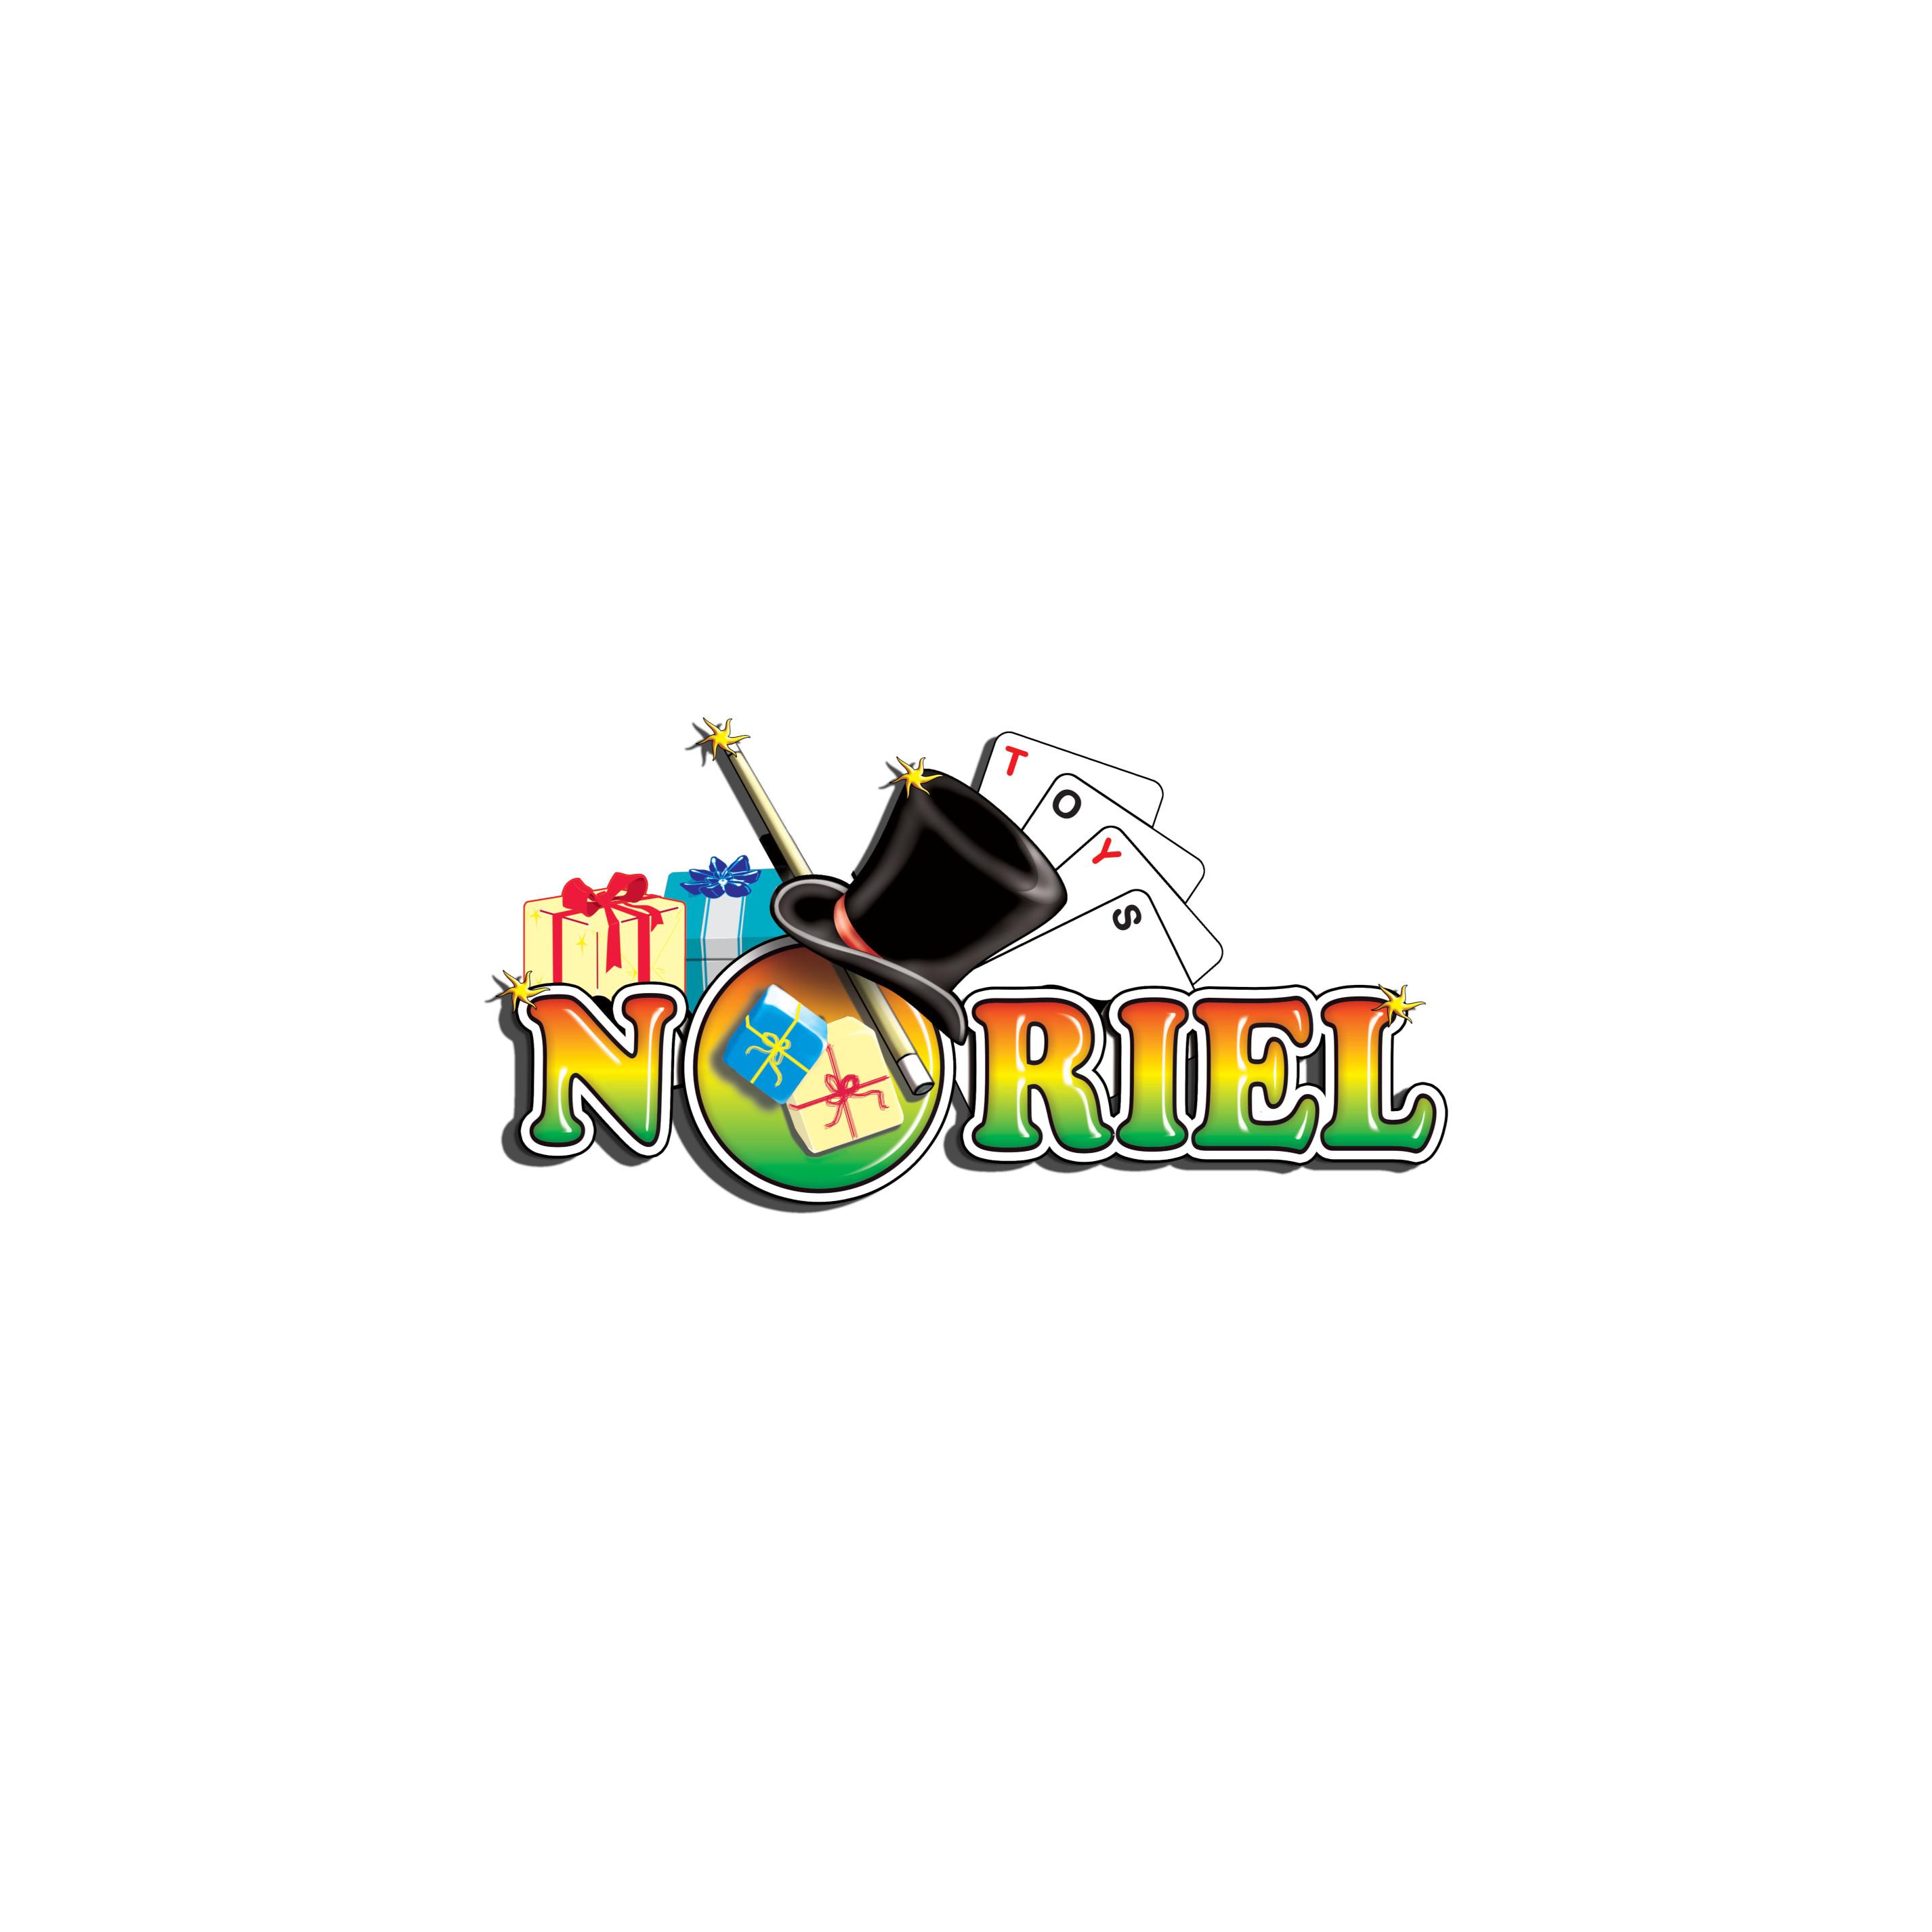 Stilou cu 2 rezerve - Mickey Mouse